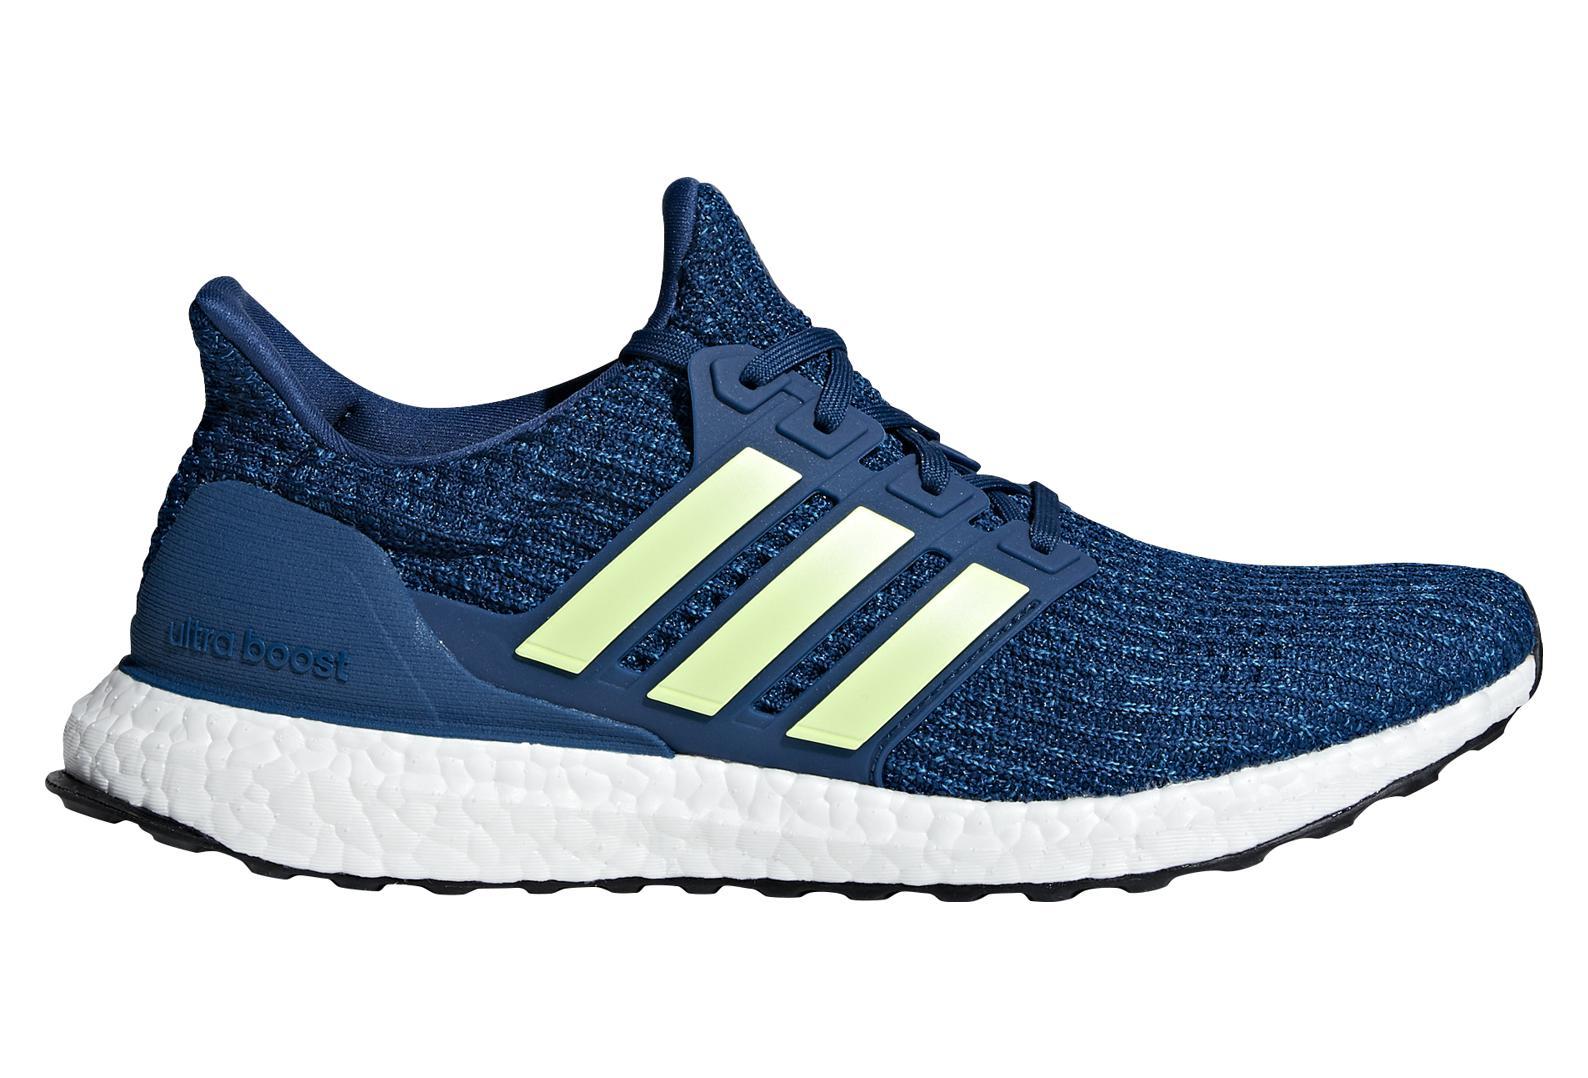 chaussures classiques chaussures de séparation baskets adidas UltraBOOST Men Bleu